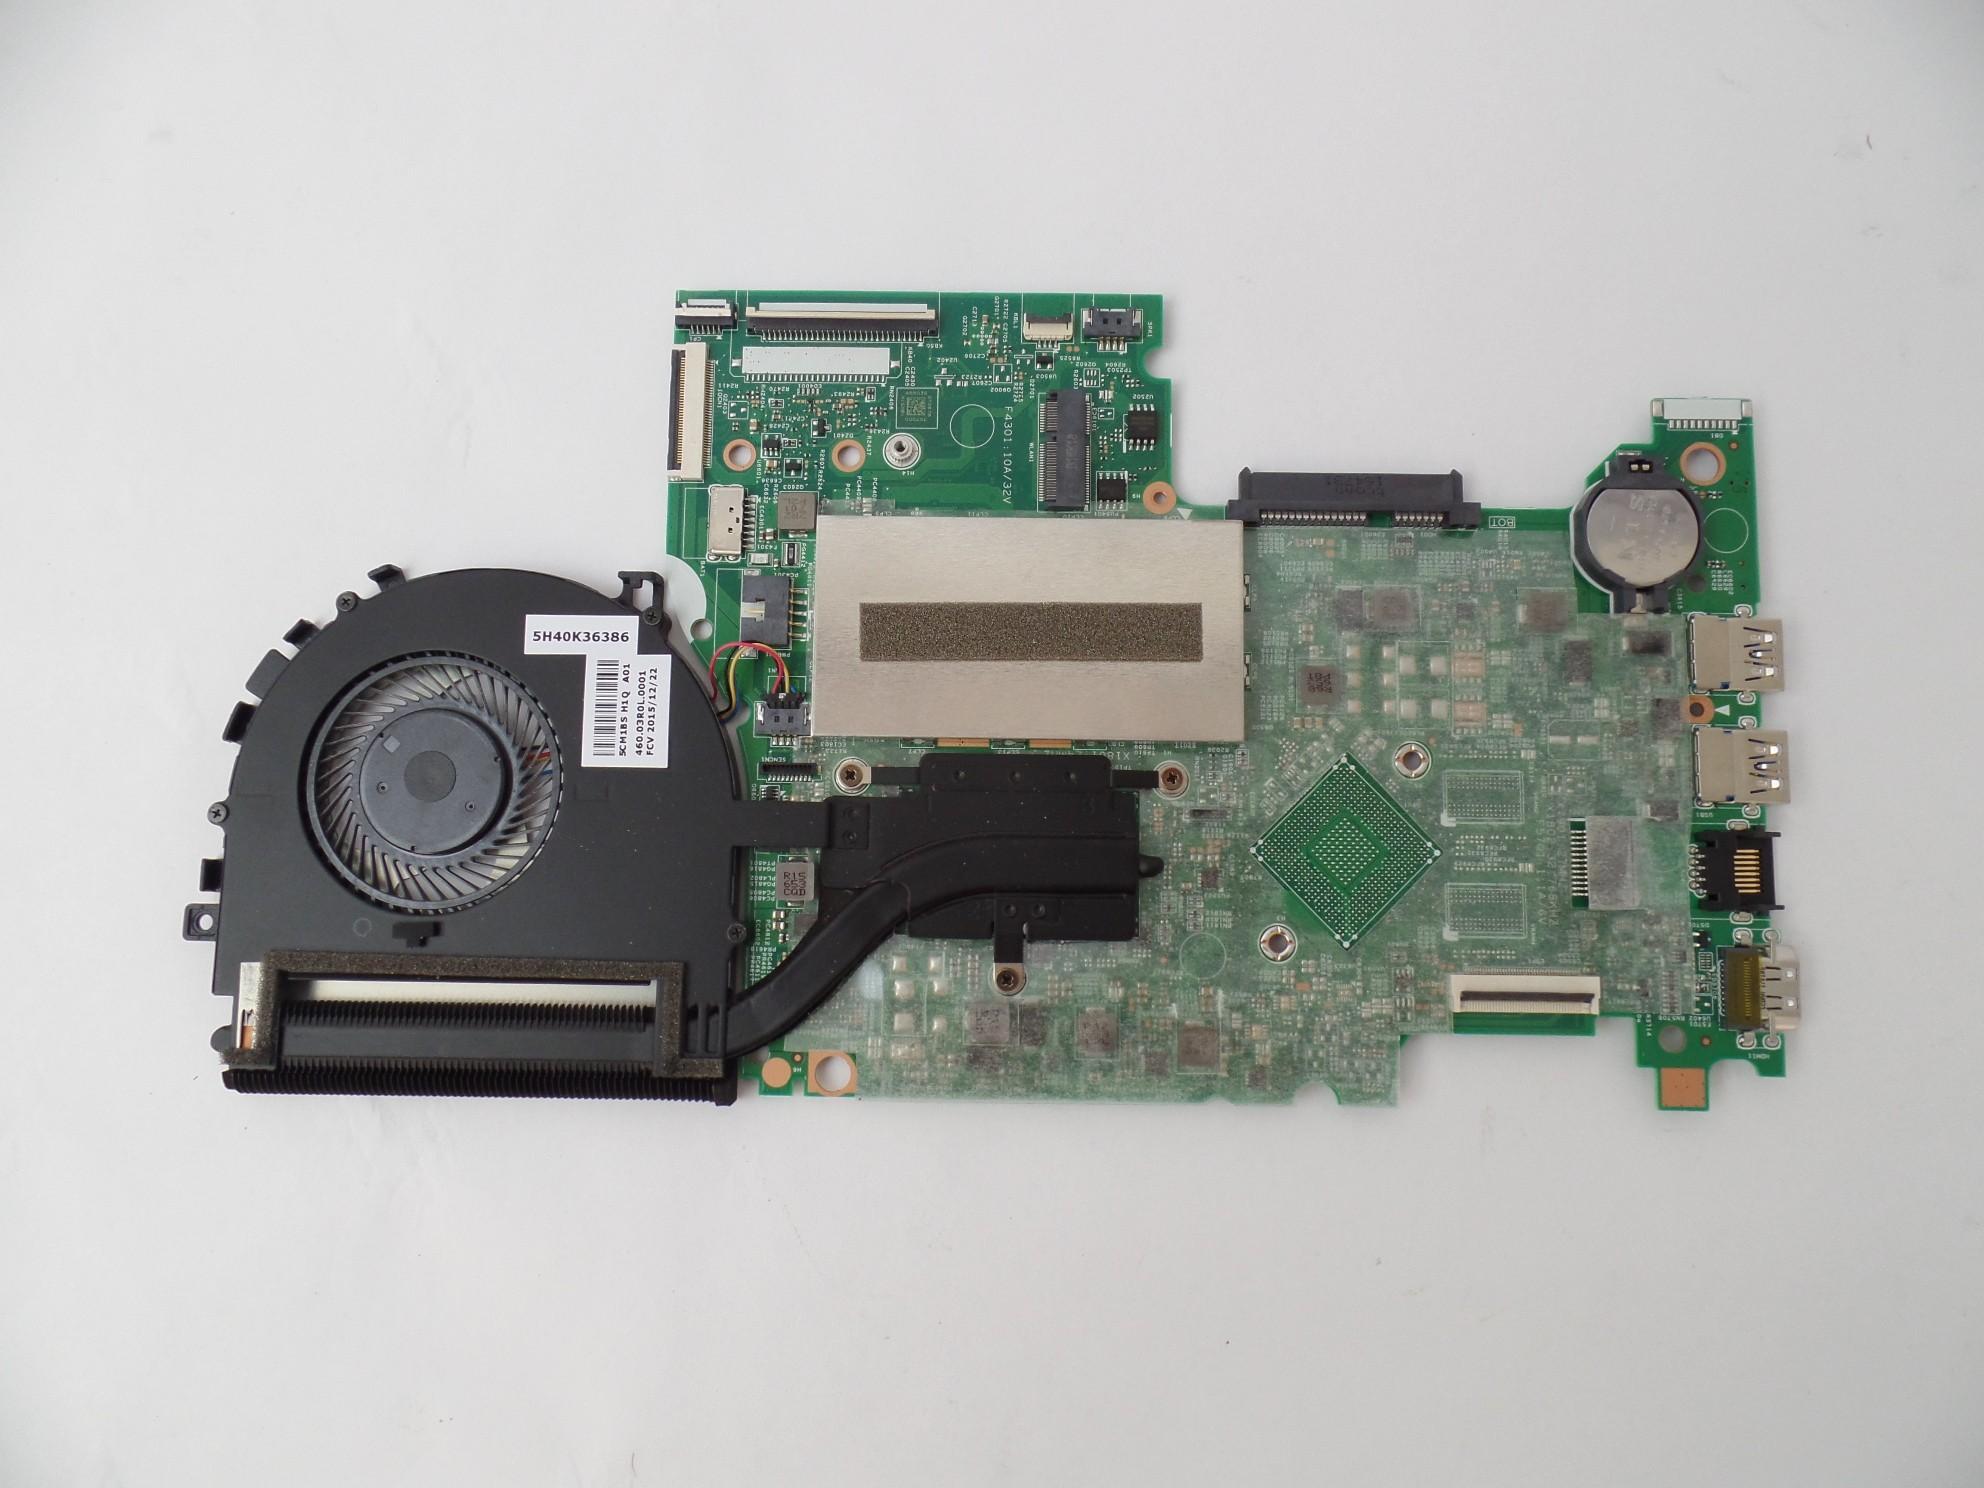 Read: Bad Motherboard for Lenovo Flex 3 1580 i7-6500U 80R4 PN: 5B20K36400